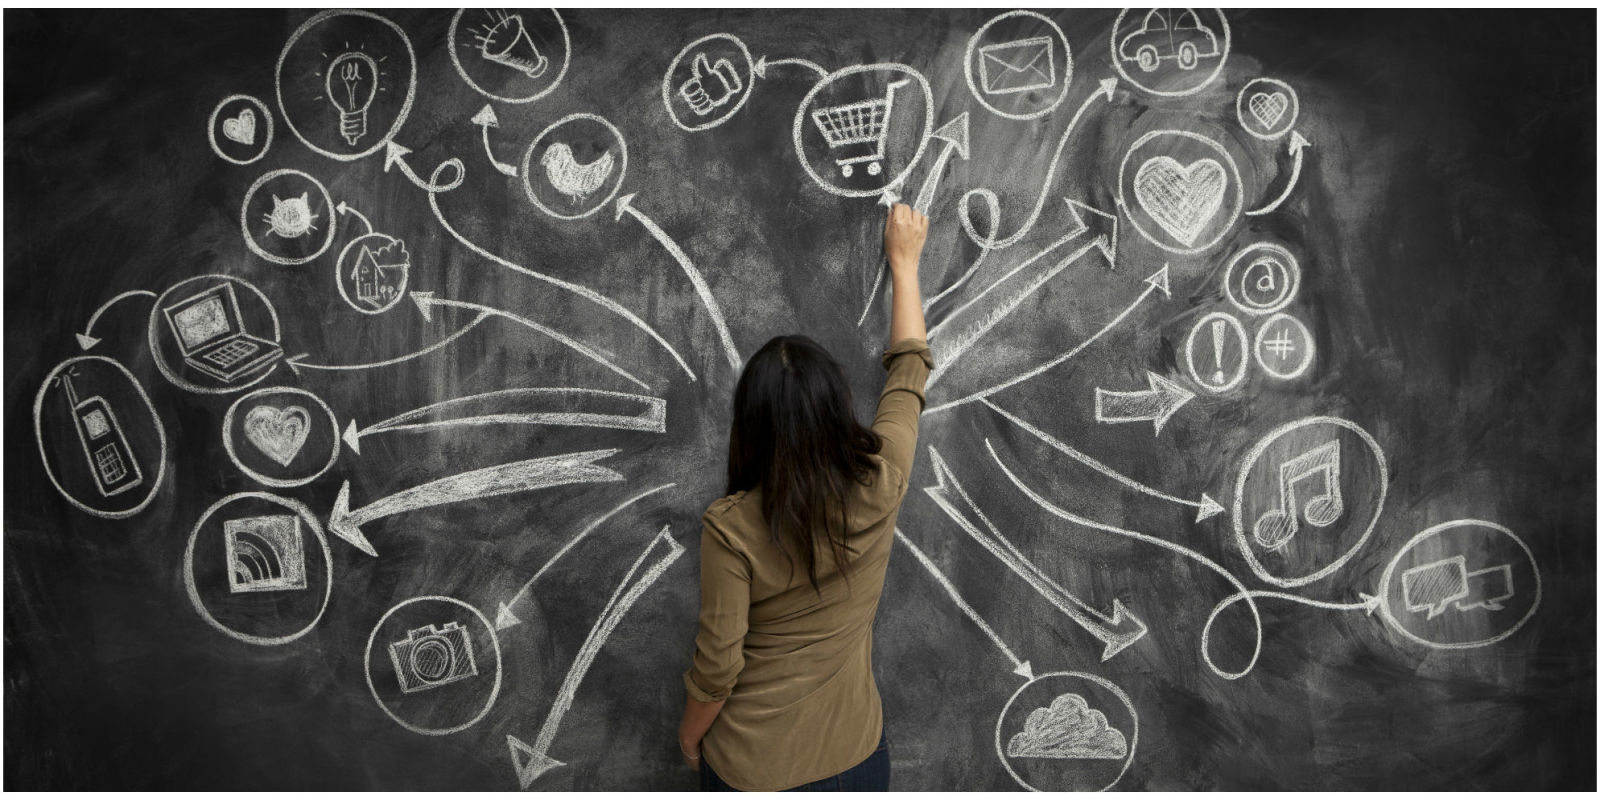 digital marketing trends - shemeansbusiness